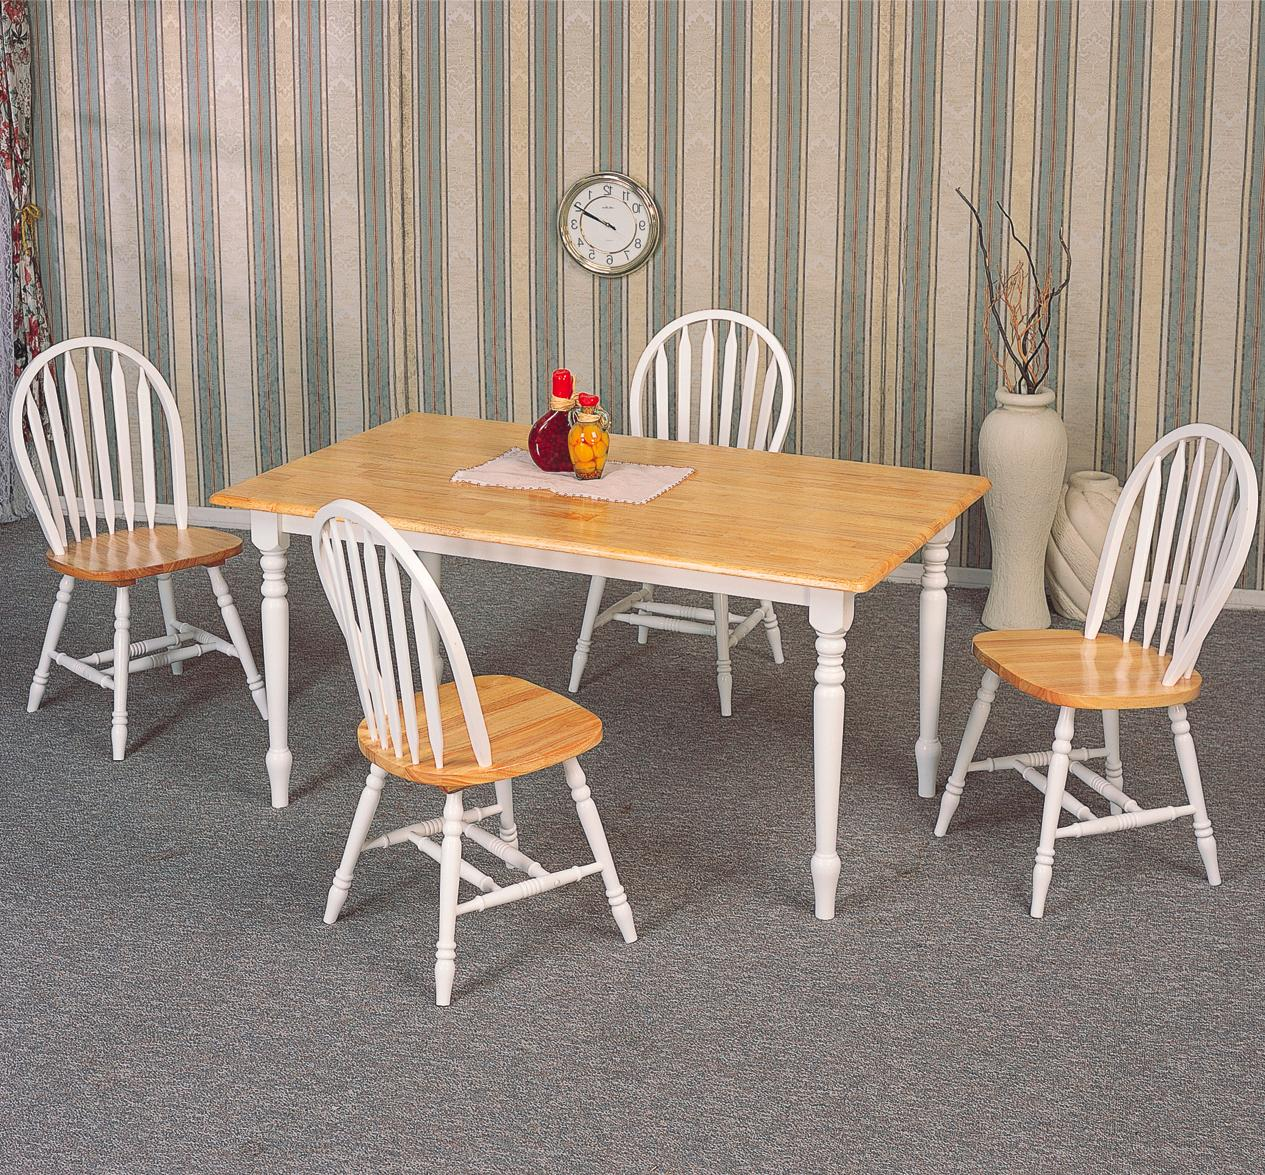 36 x 60 dining table rectangular coaster damen piece dining set a1 furniture mattress sets